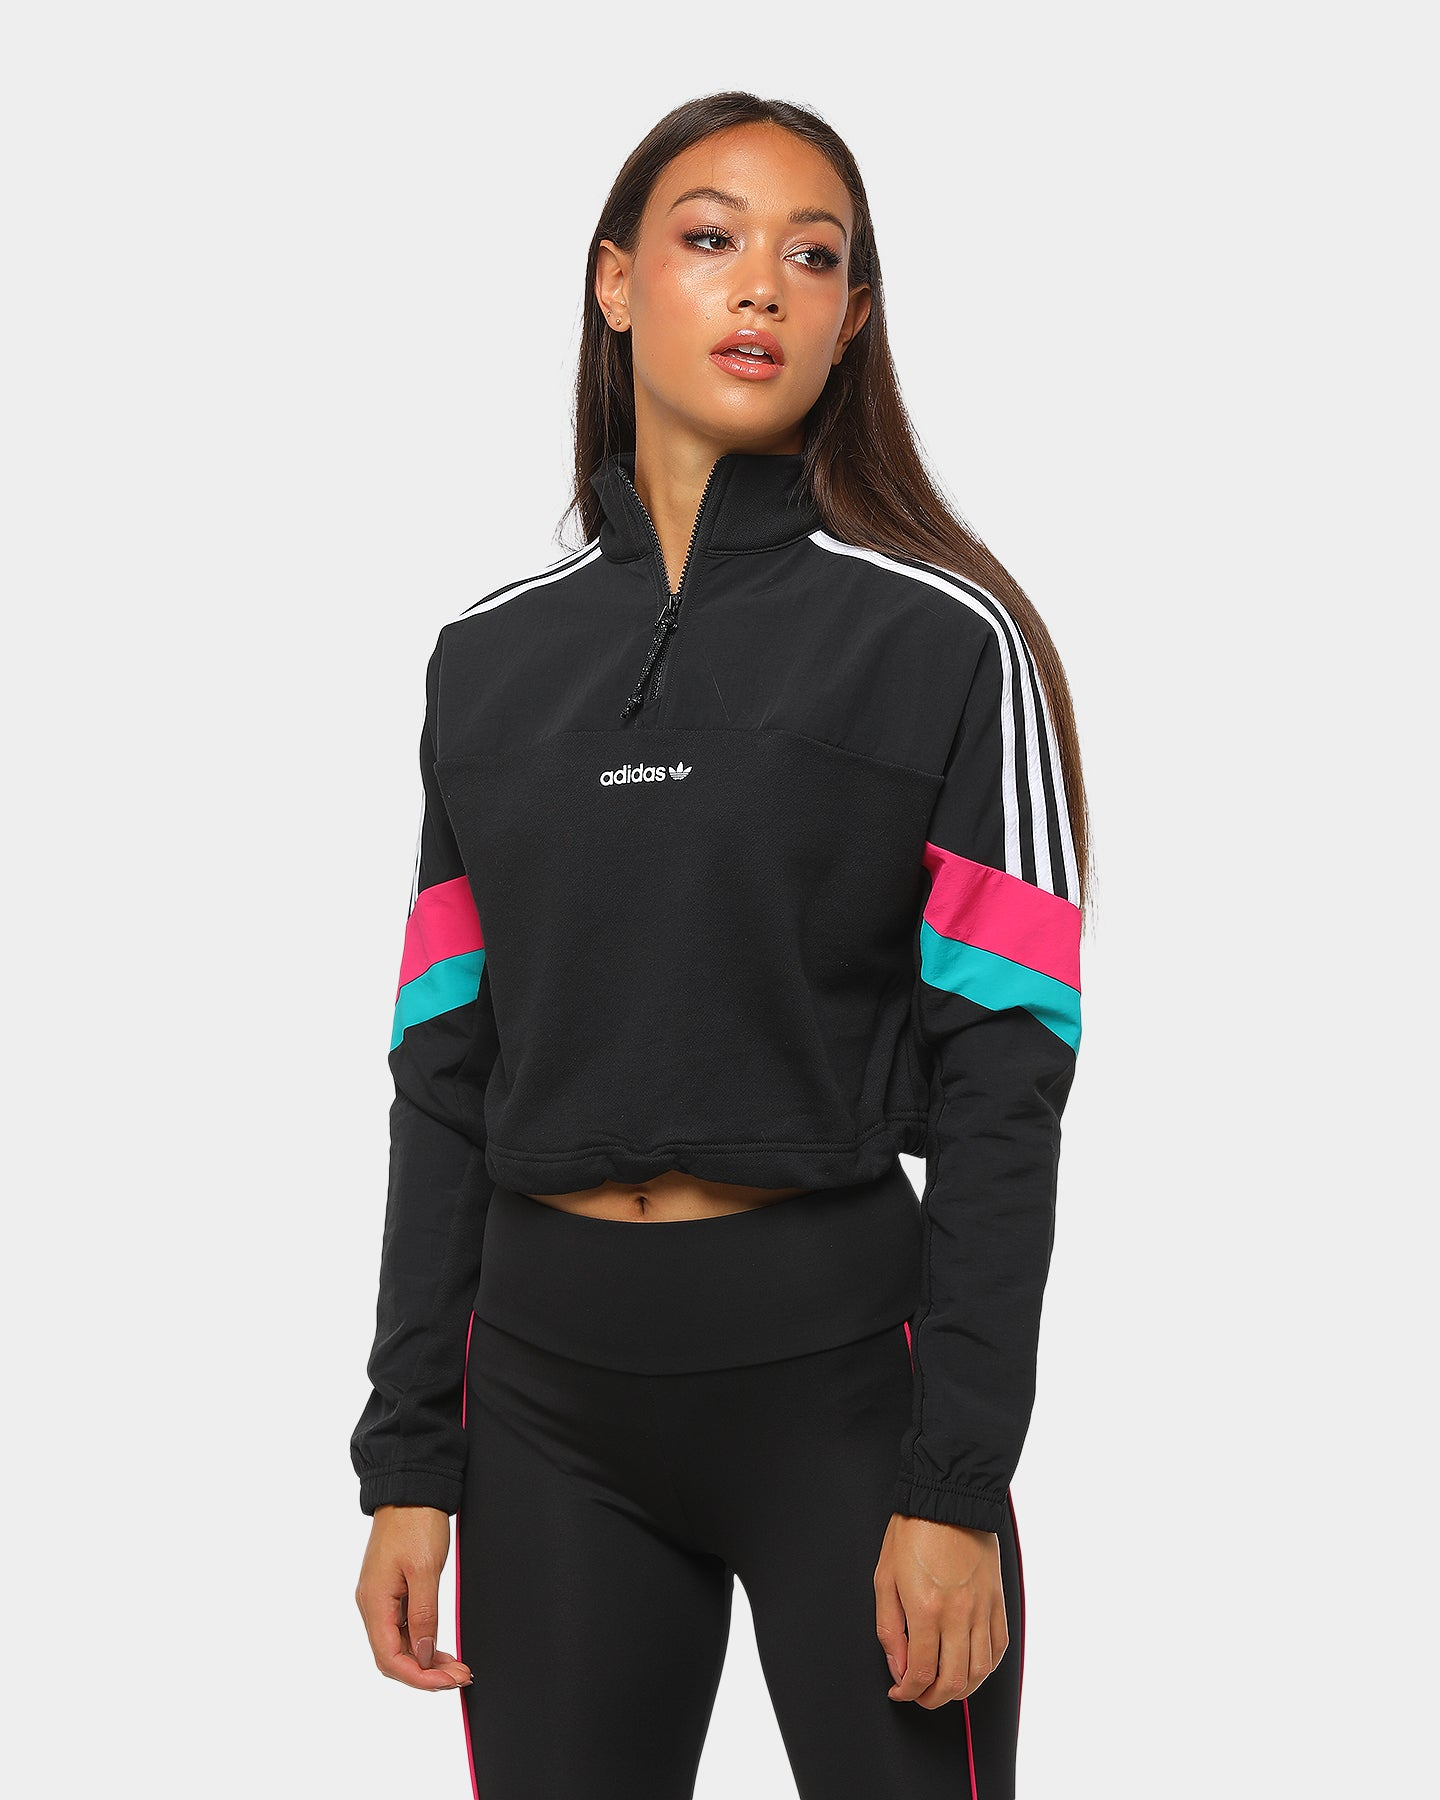 Adidas Women's Half Zip Cropped Top Black